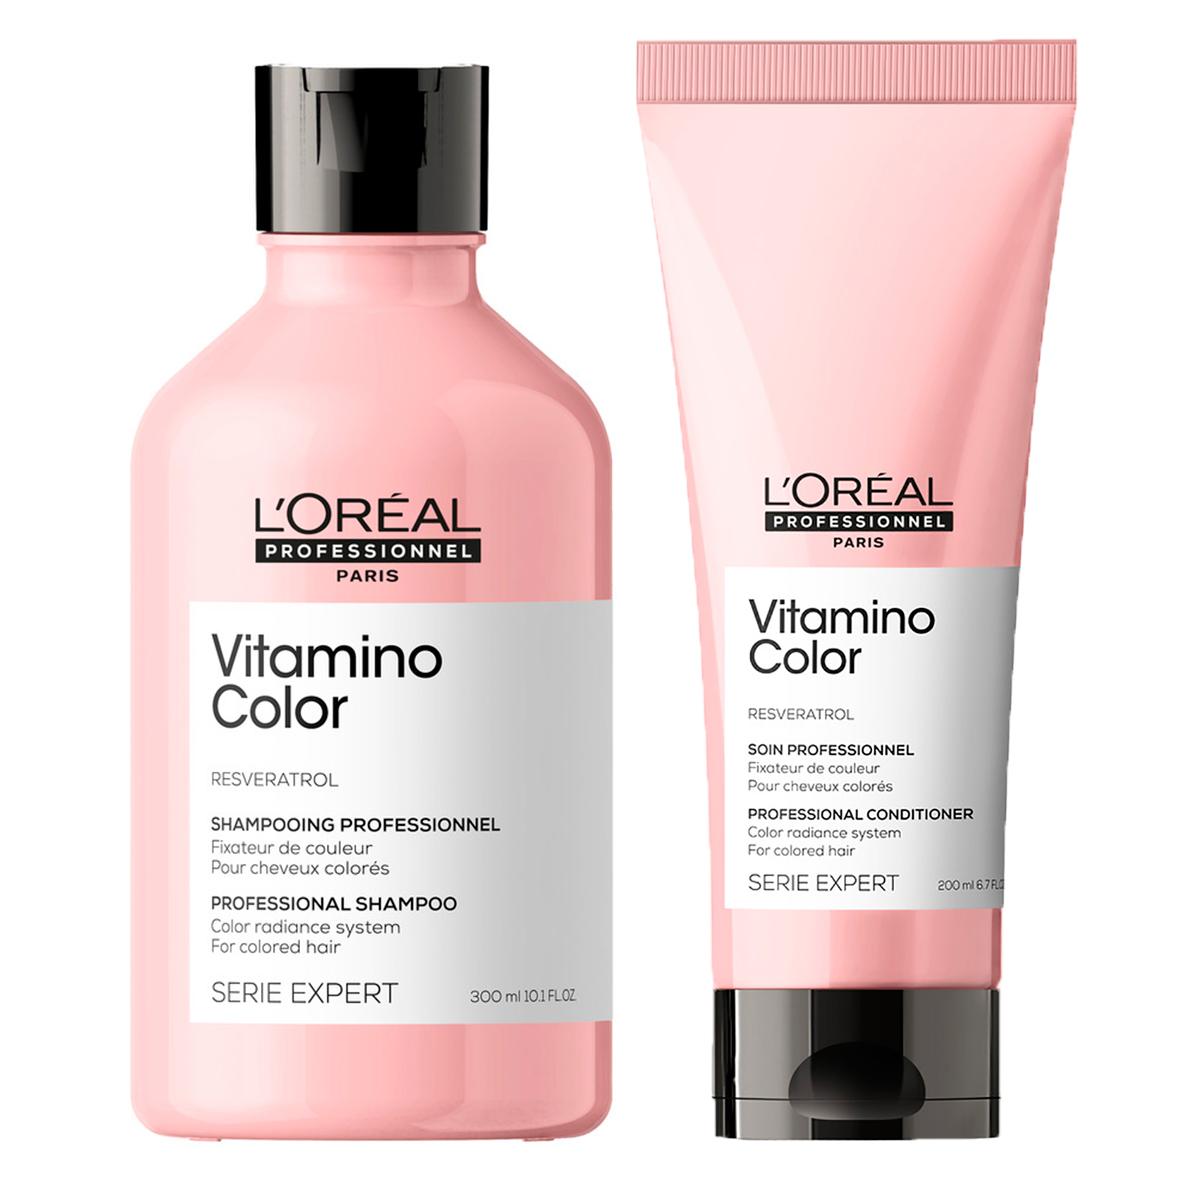 Купить Loreal Professionnel Набор Vitamino Color: Шампунь, 300 мл + Кондиционер, 200 мл (Loreal Professionnel, Serie Expert), Франция